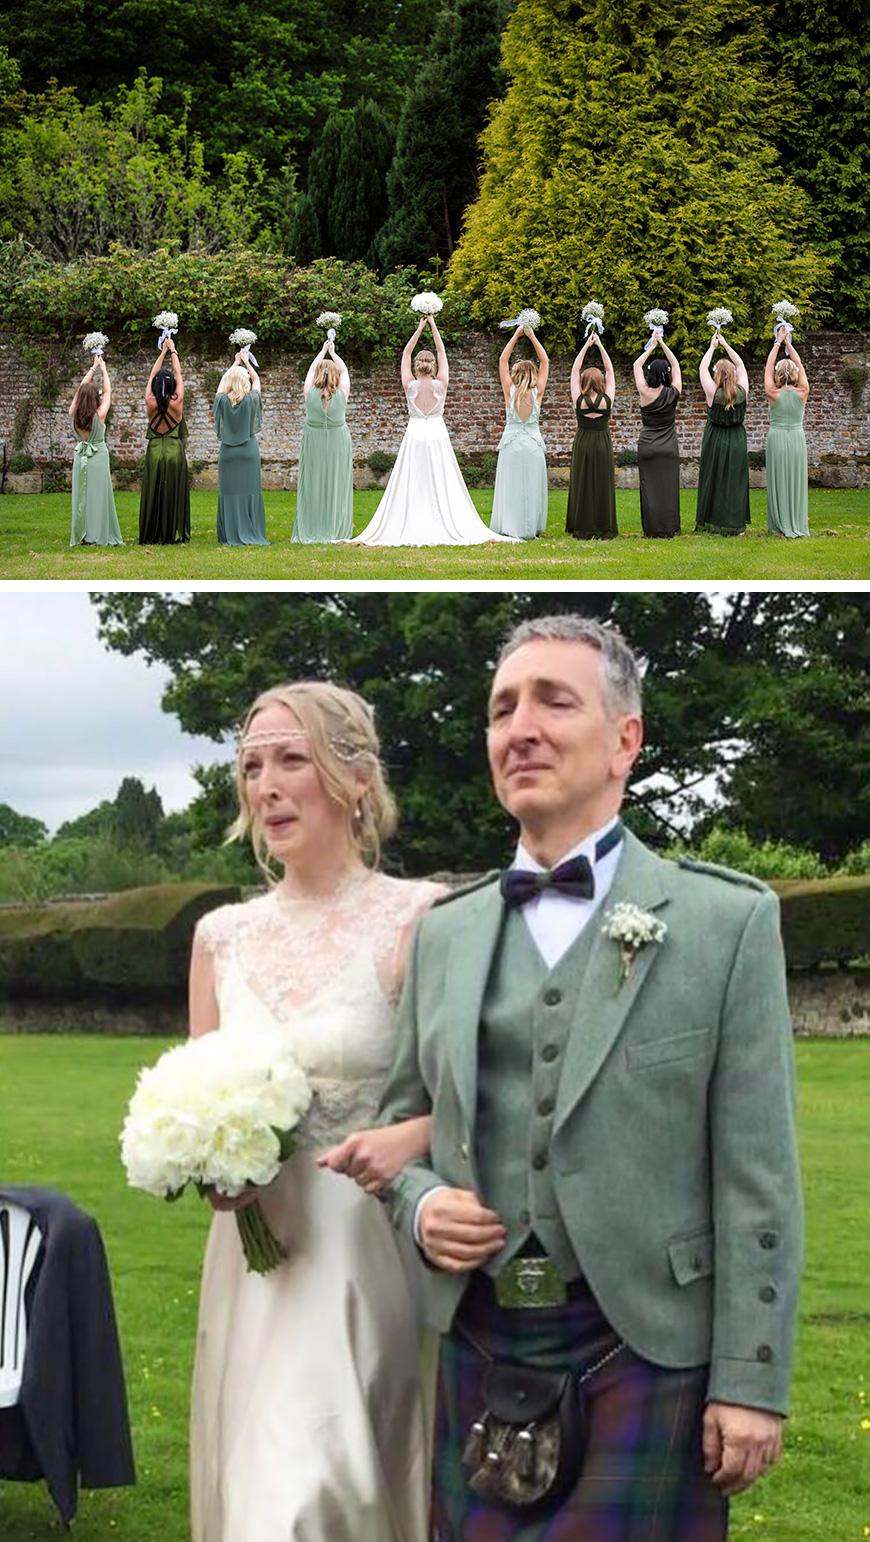 Real Wedding - Emma and Gareth's Stunning Spring Wedding At Slaugham Place | CHWV